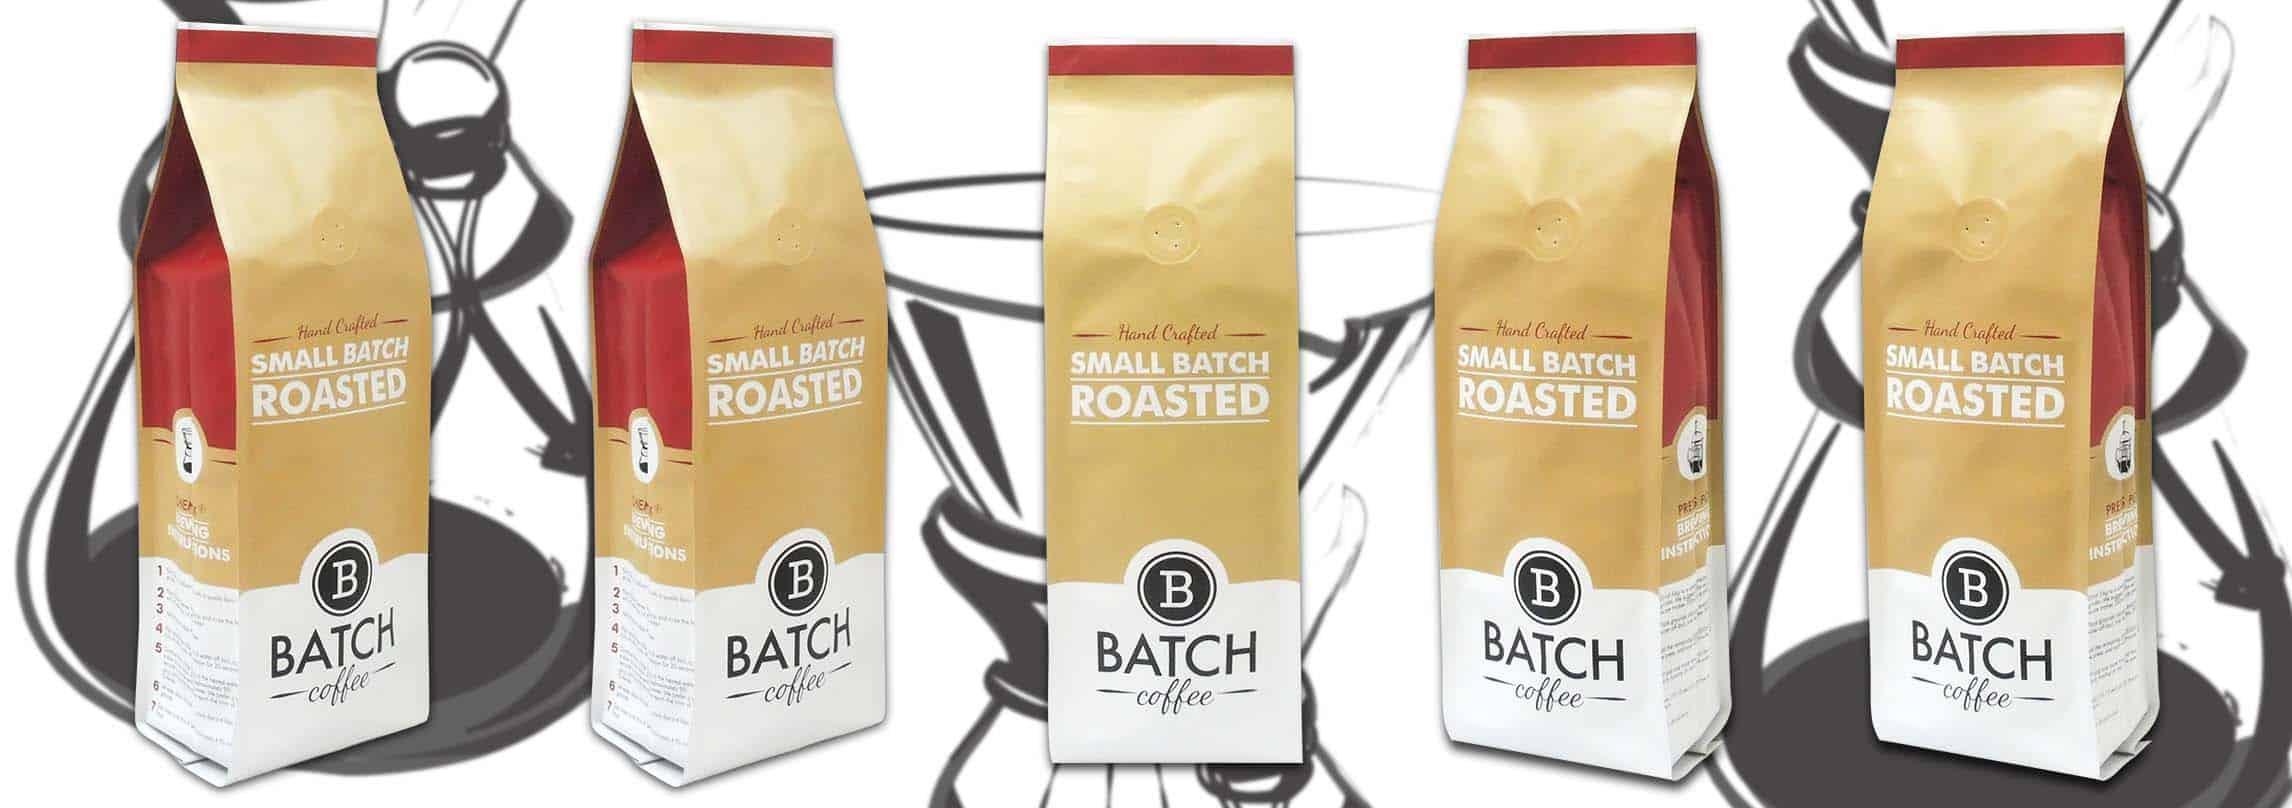 Small Batch Roasted Coffee